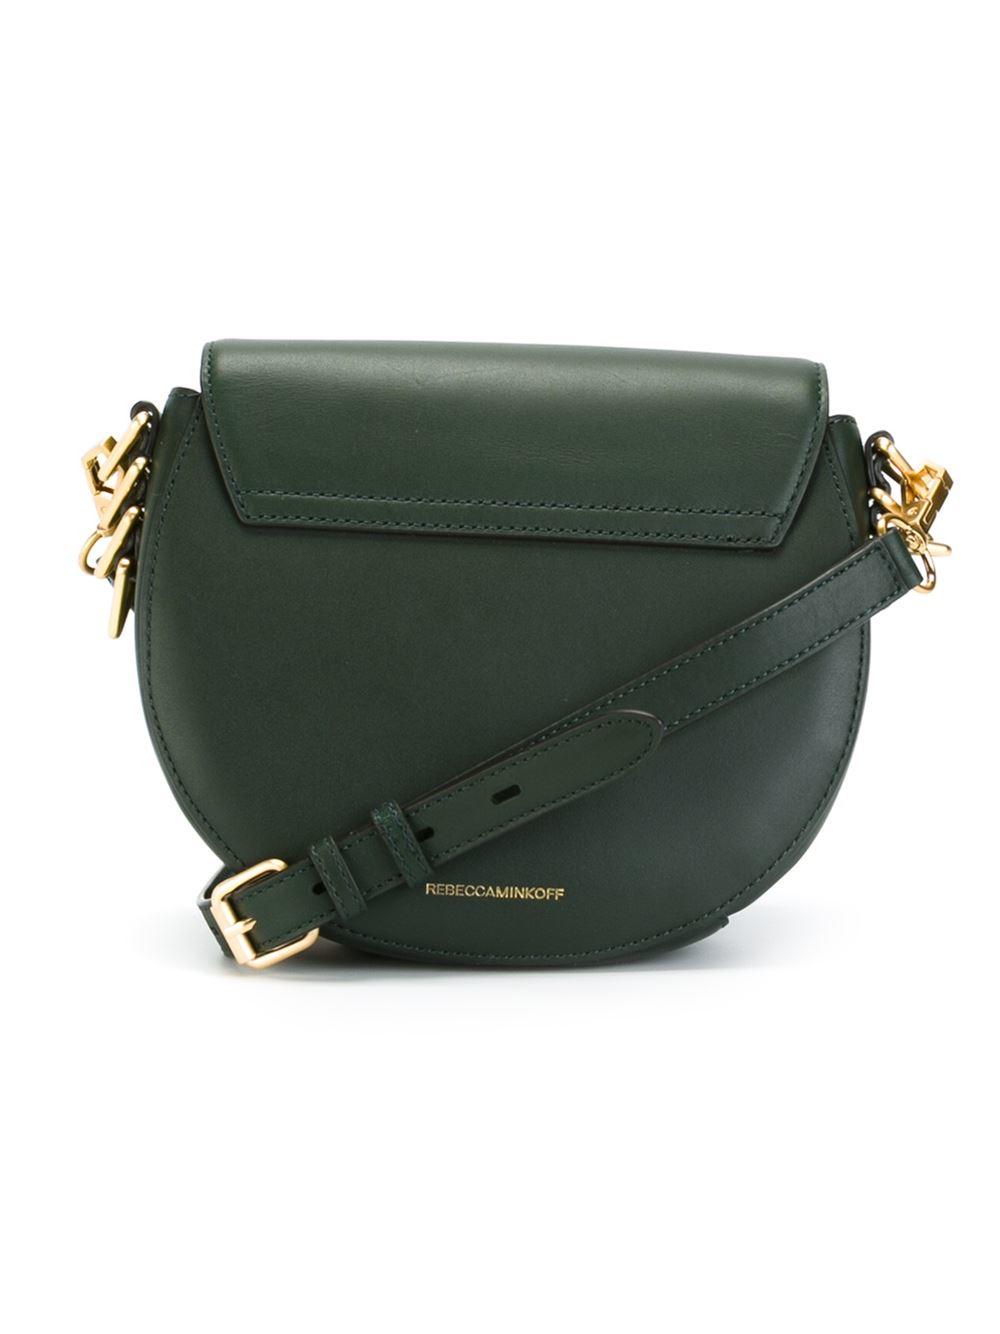 Rebecca Minkoff Leather 'astor' Crossbody Bag in Green